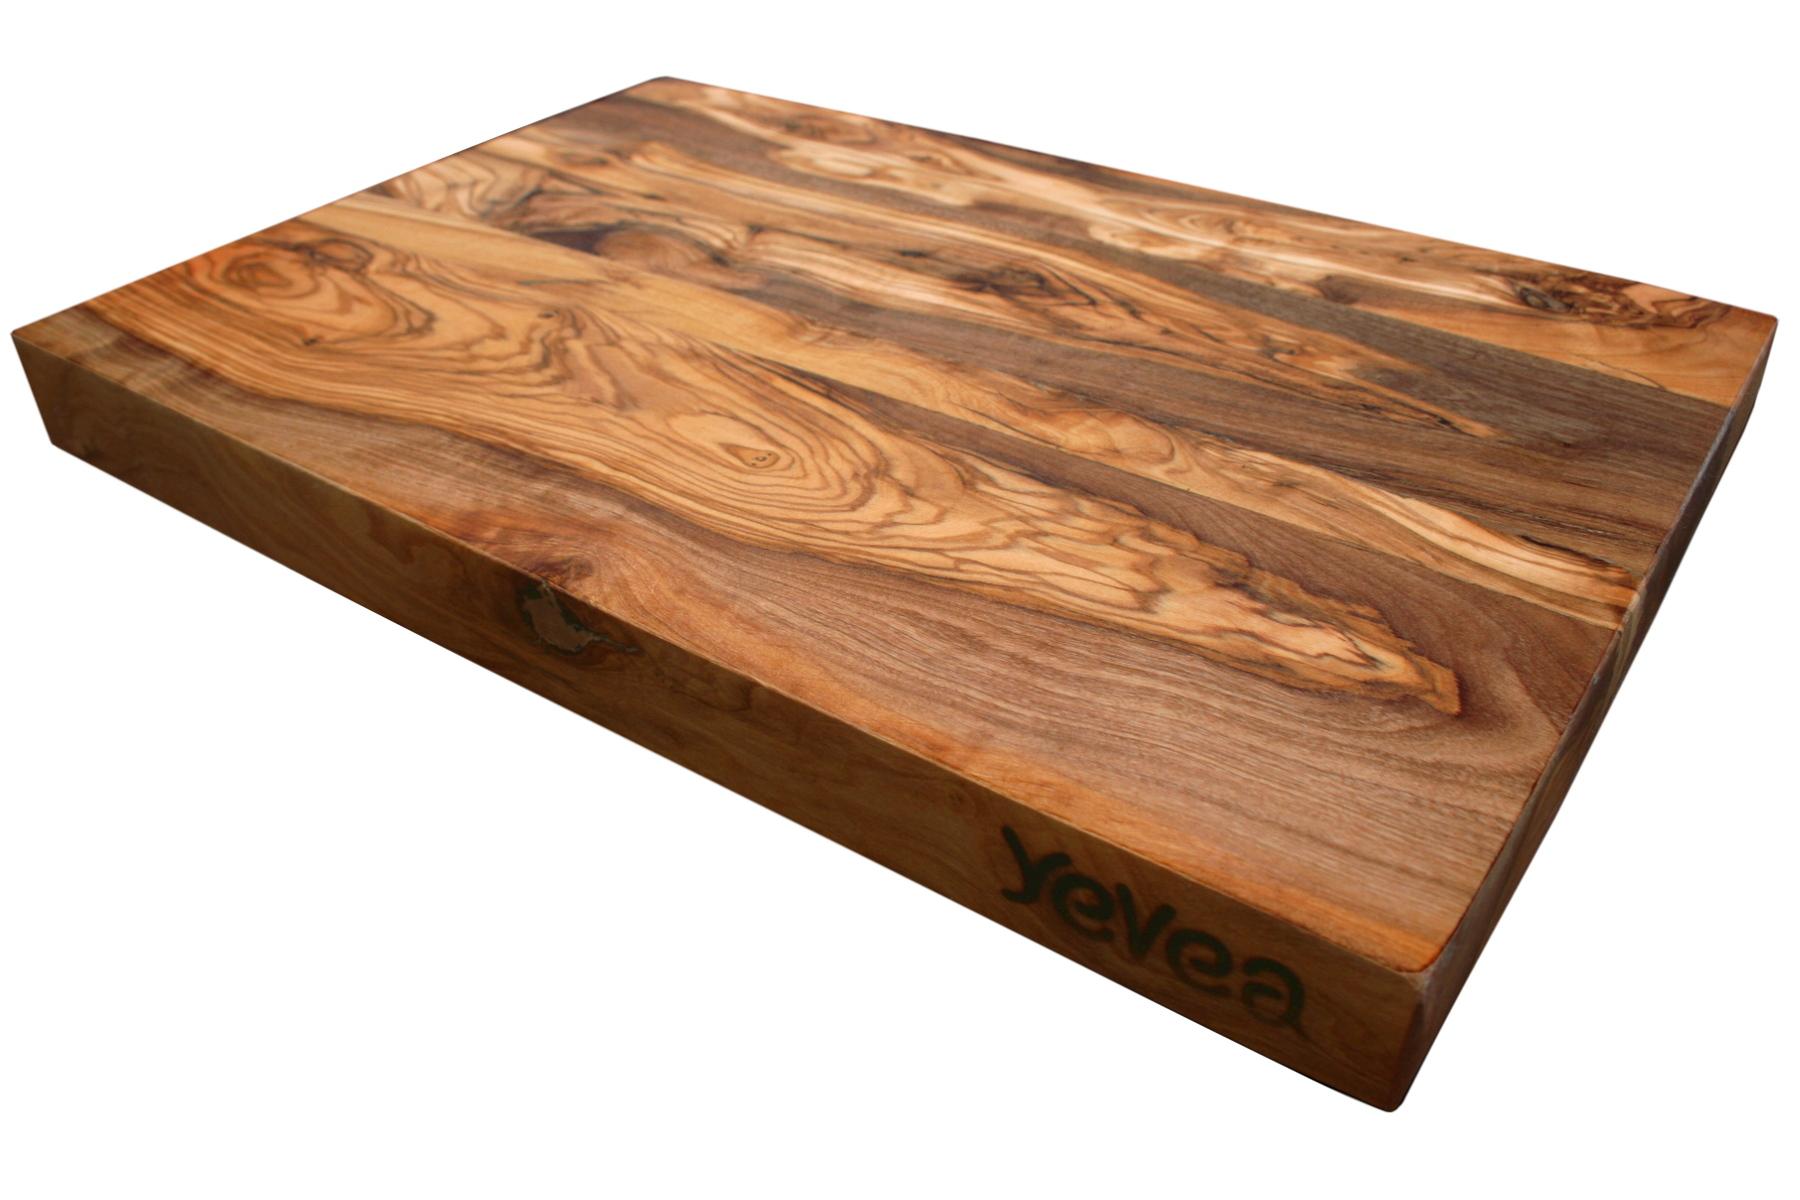 La foto hot de cande tinelli calienta las redes taringa for La beta de la madera